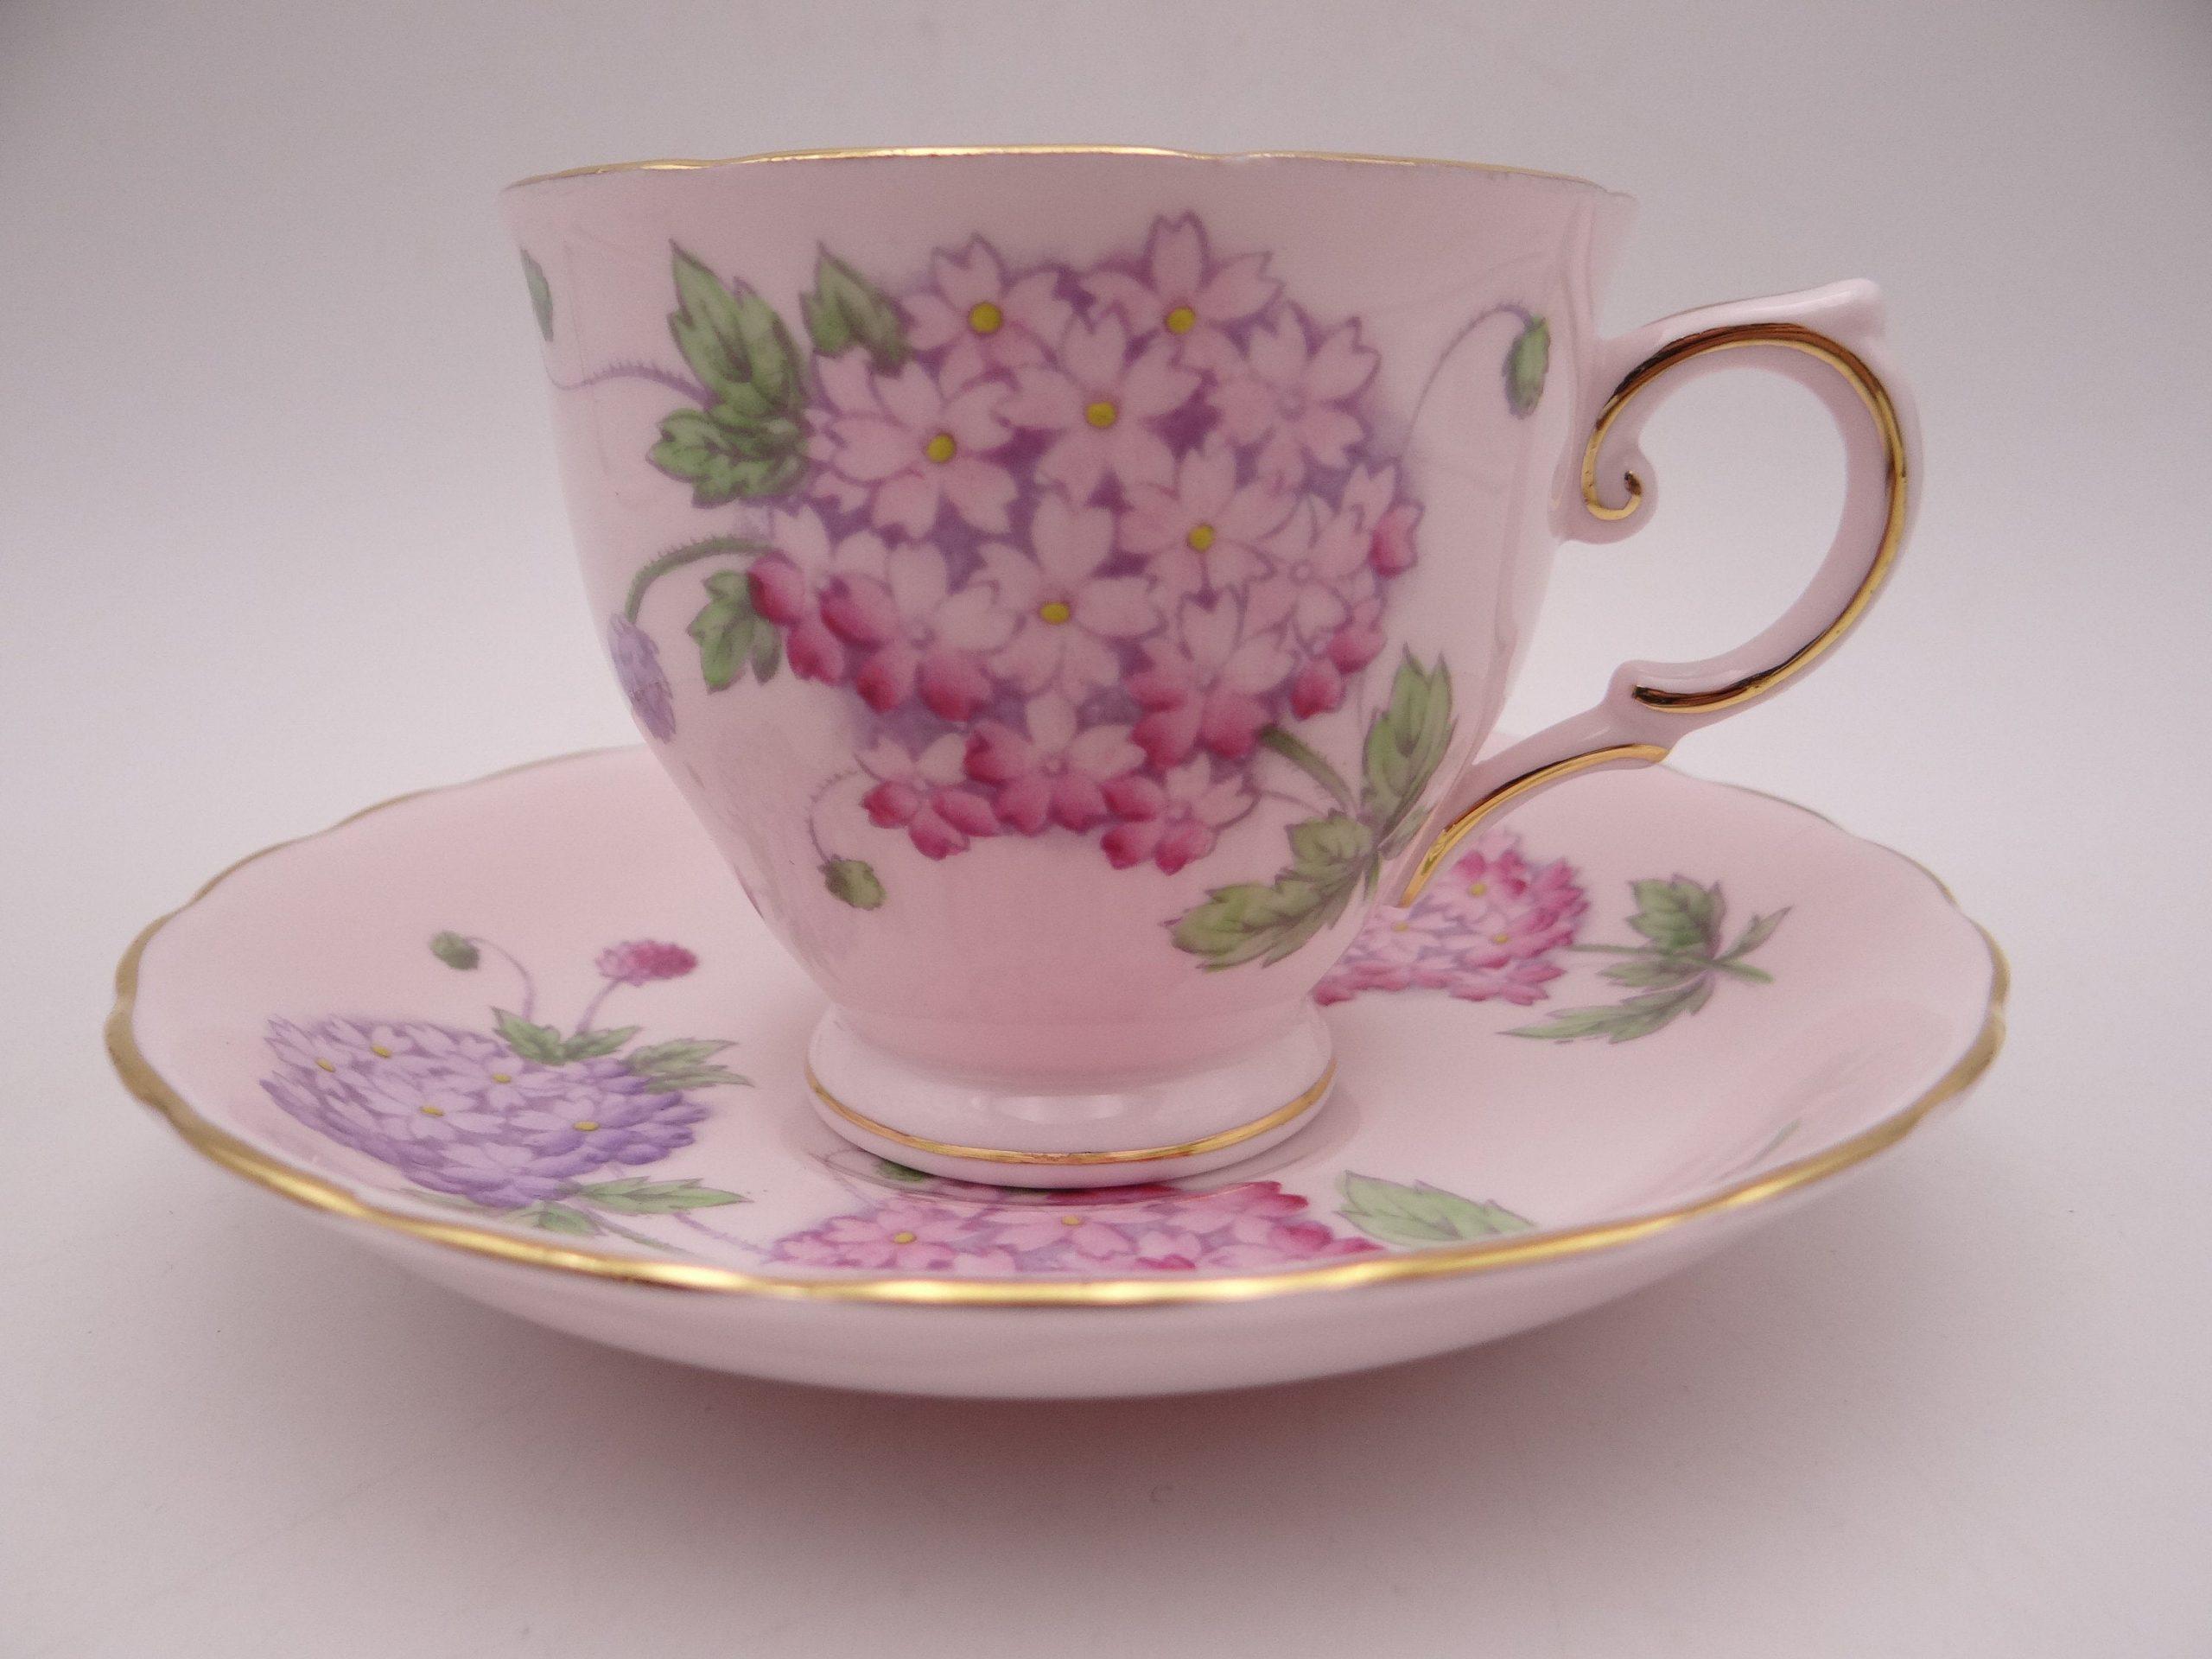 Duchess Bone China Tea Cup and Saucer Pink Chrysanthemums